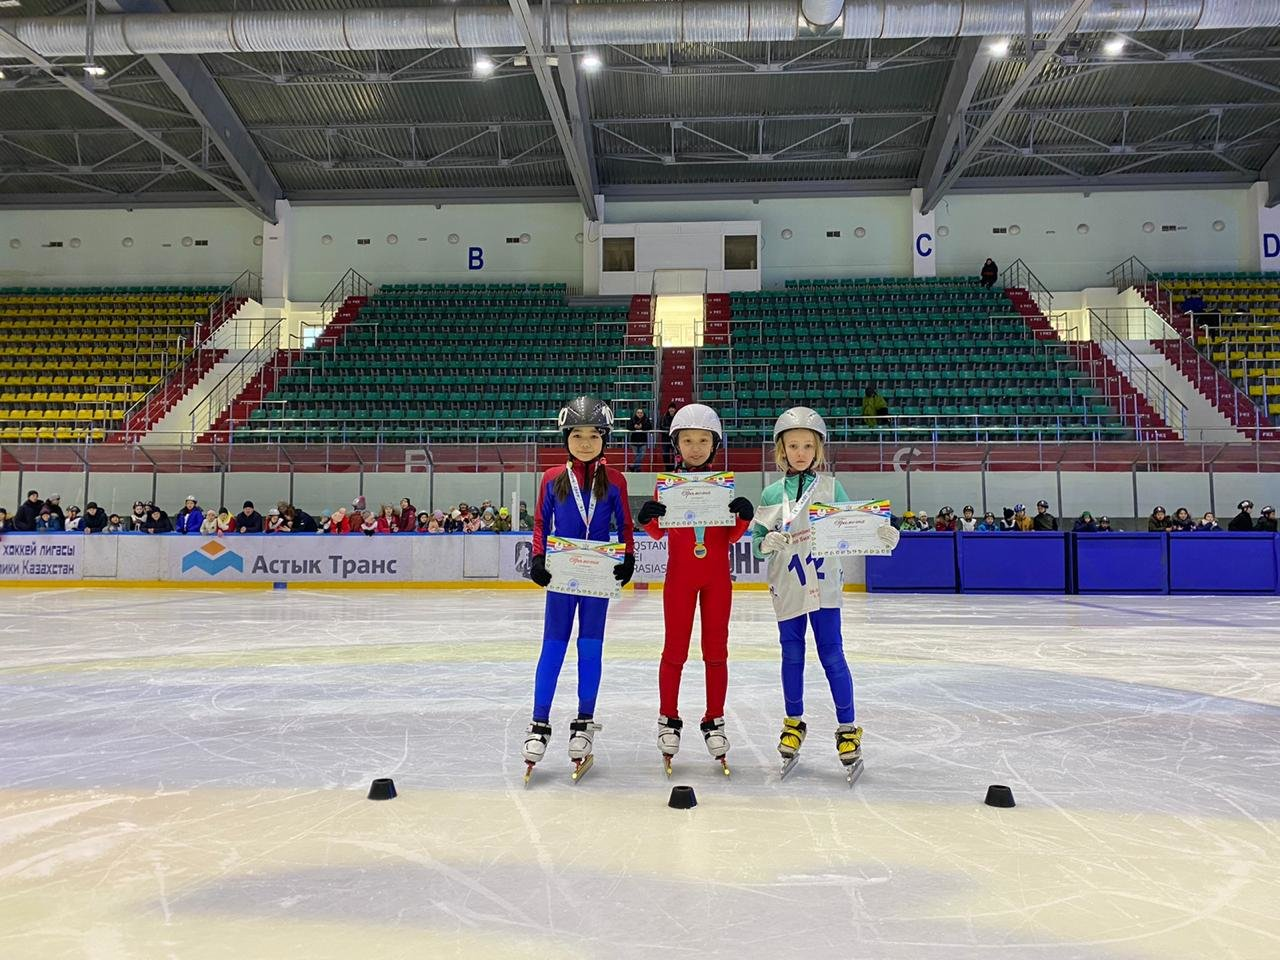 Чемпионат по жиму лёжа прошёл в Акмолинской области (фото), фото-7